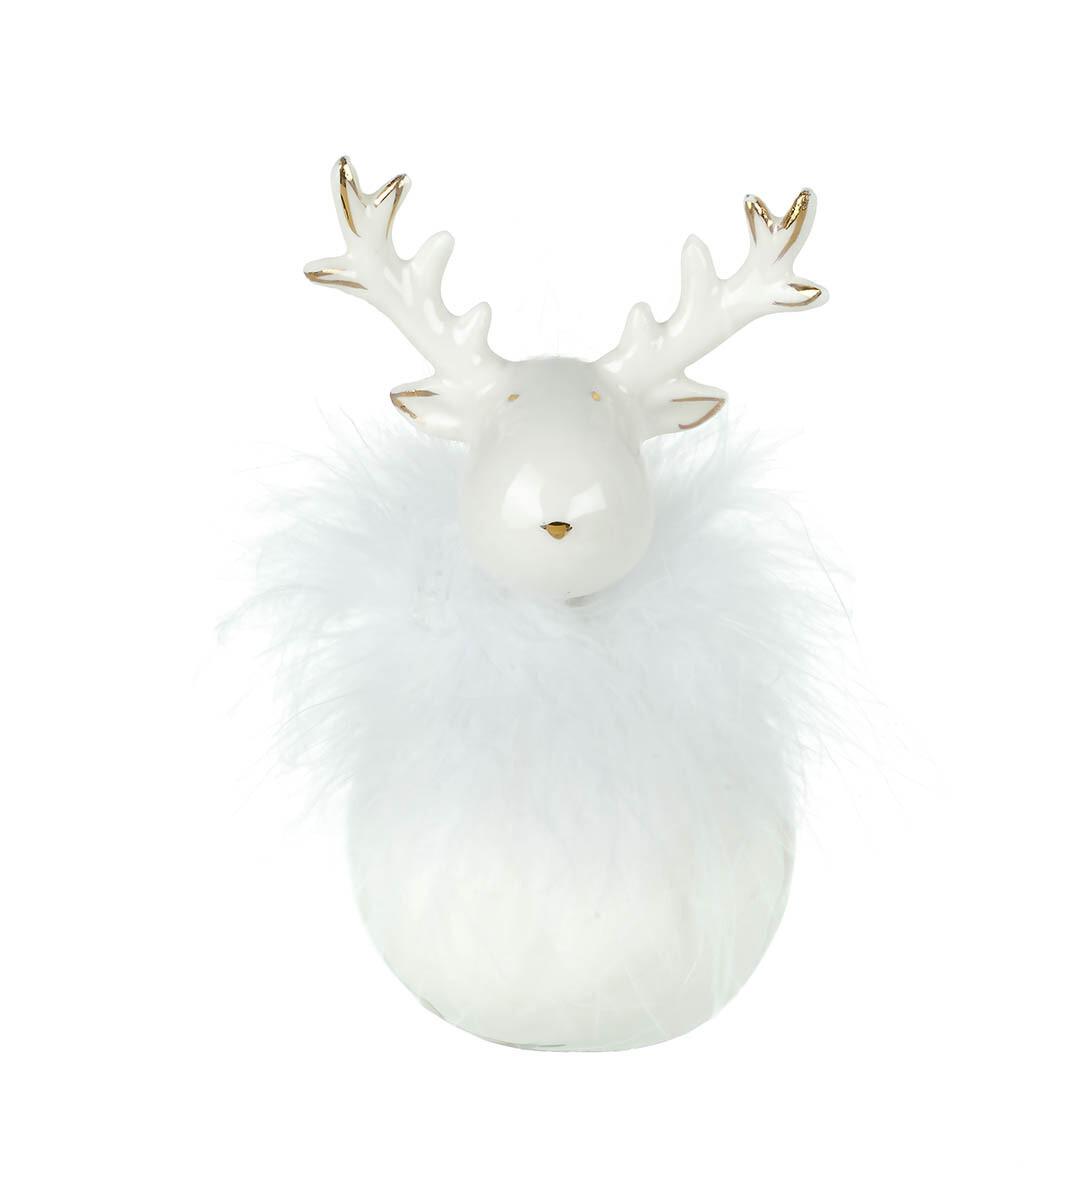 Porcelain Reindeer with Fluffy Trim